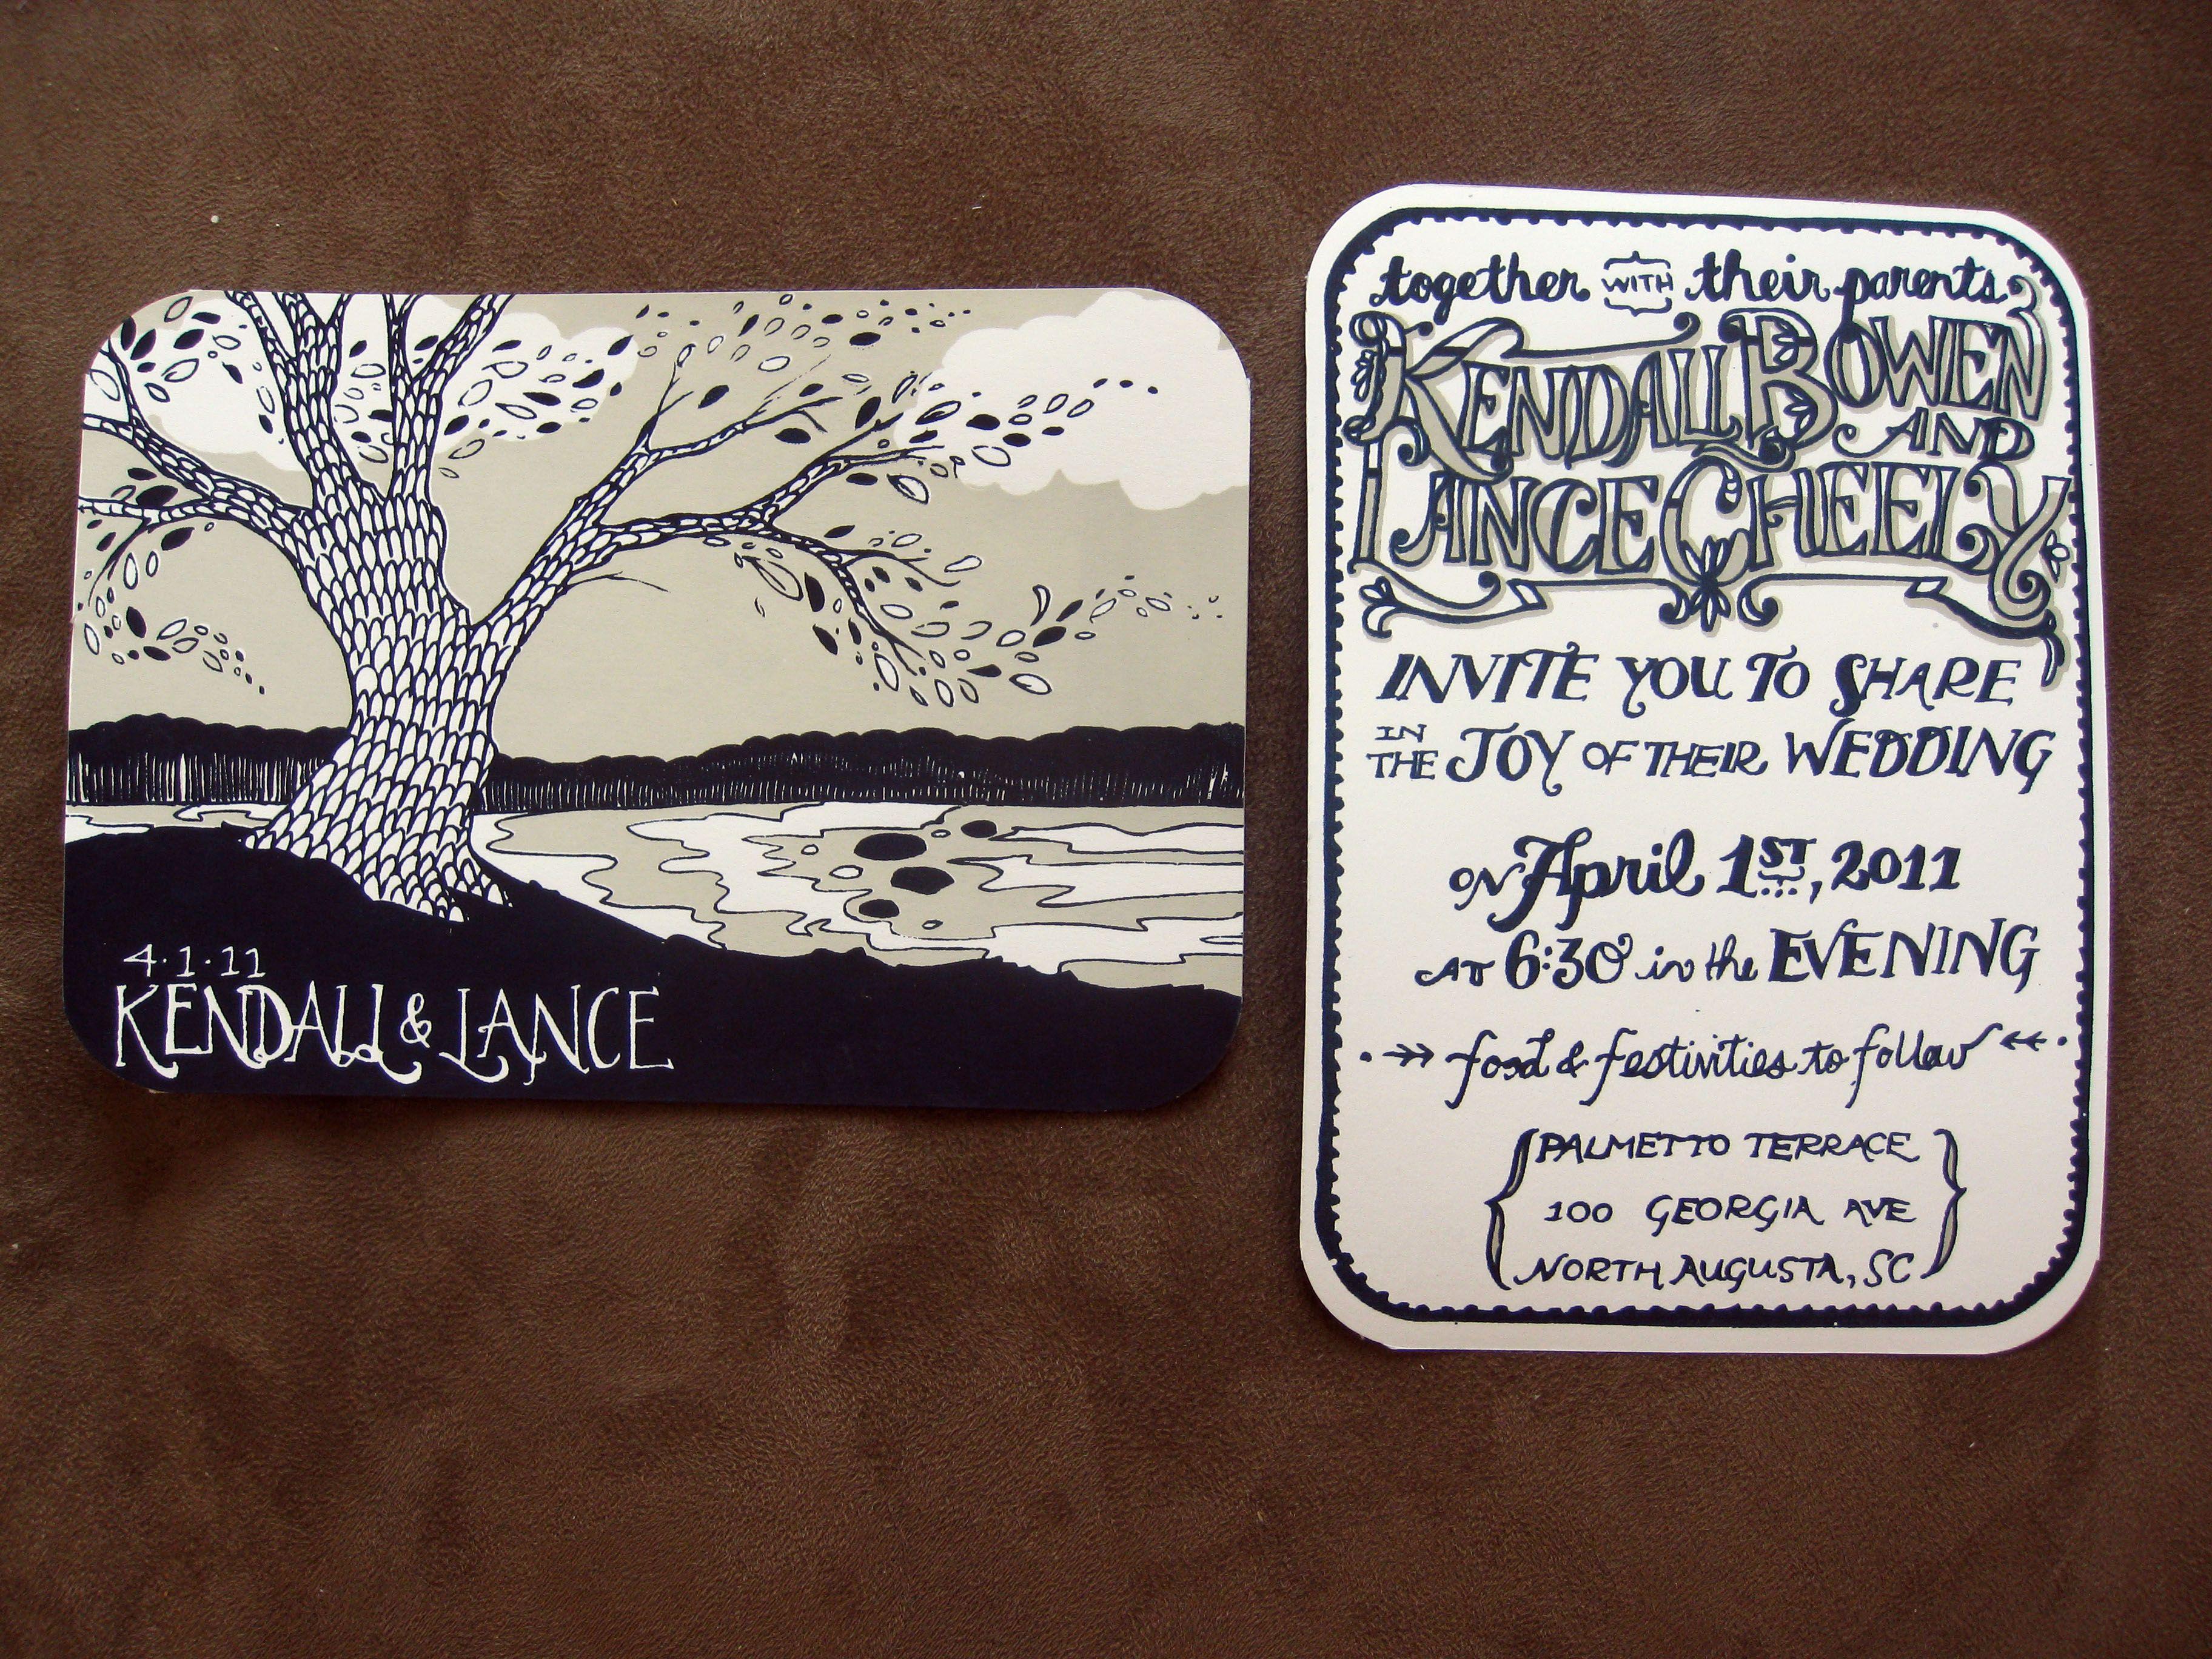 Creative wedding invitation dwadeot6g 36482736 crafty different wedding invitations examples monicamarmolfo Gallery